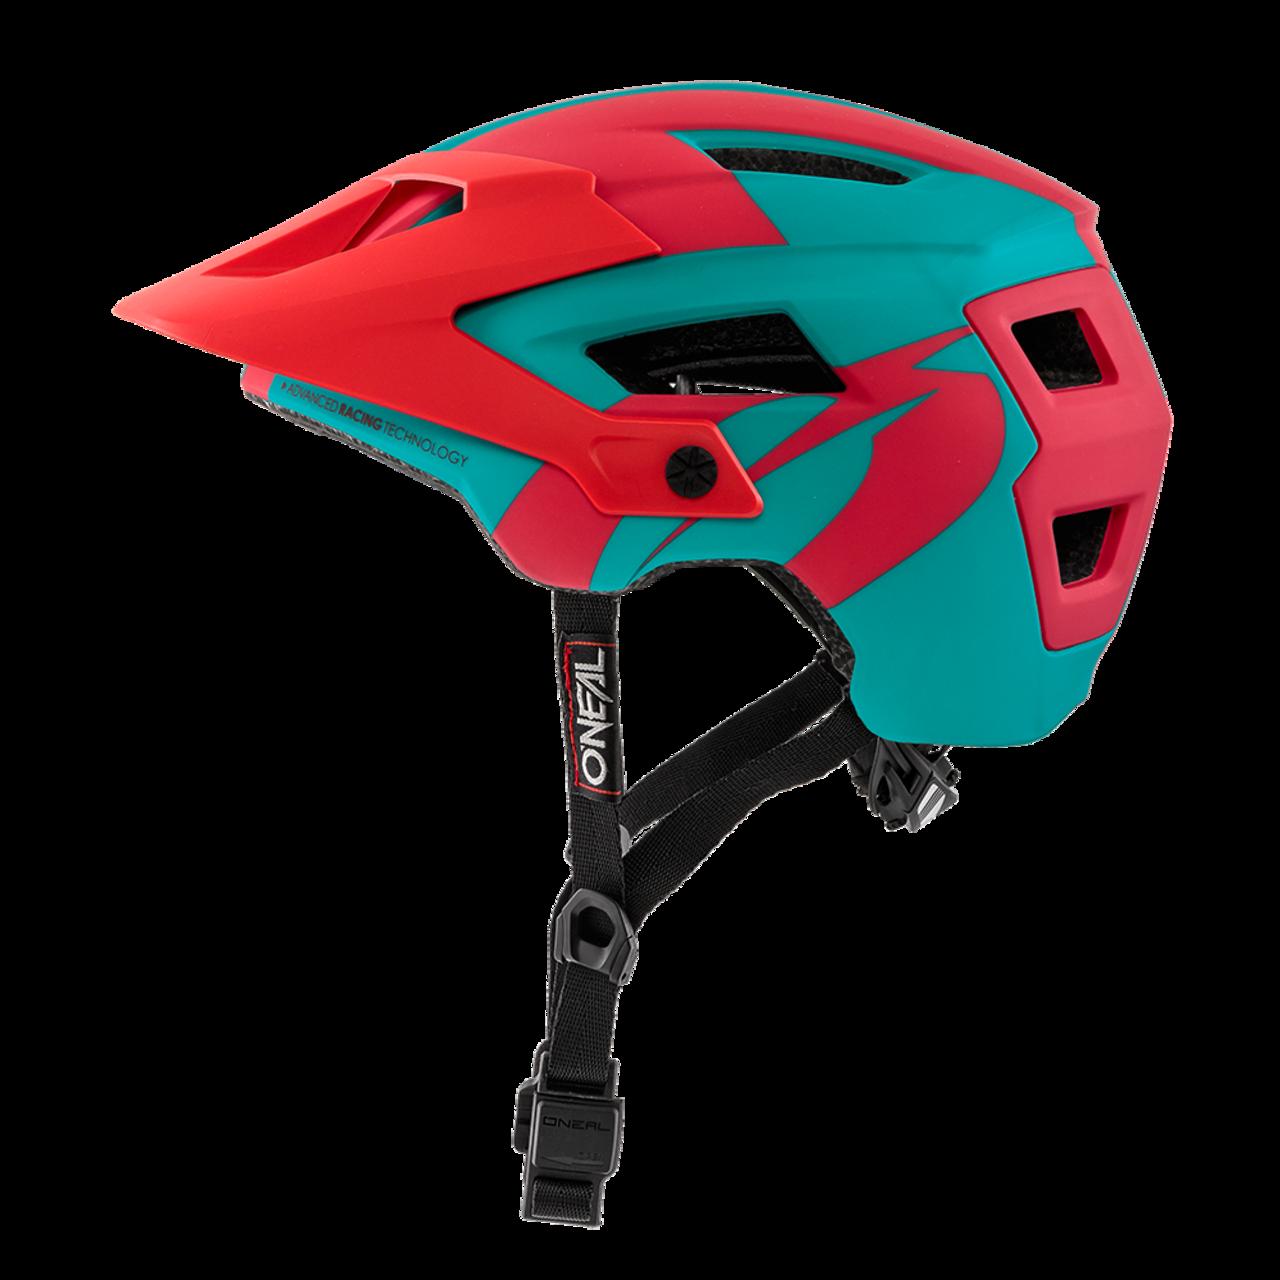 Велошлем O´Neal Defender 2.0 Sliver Teal/Red 2018 недорого